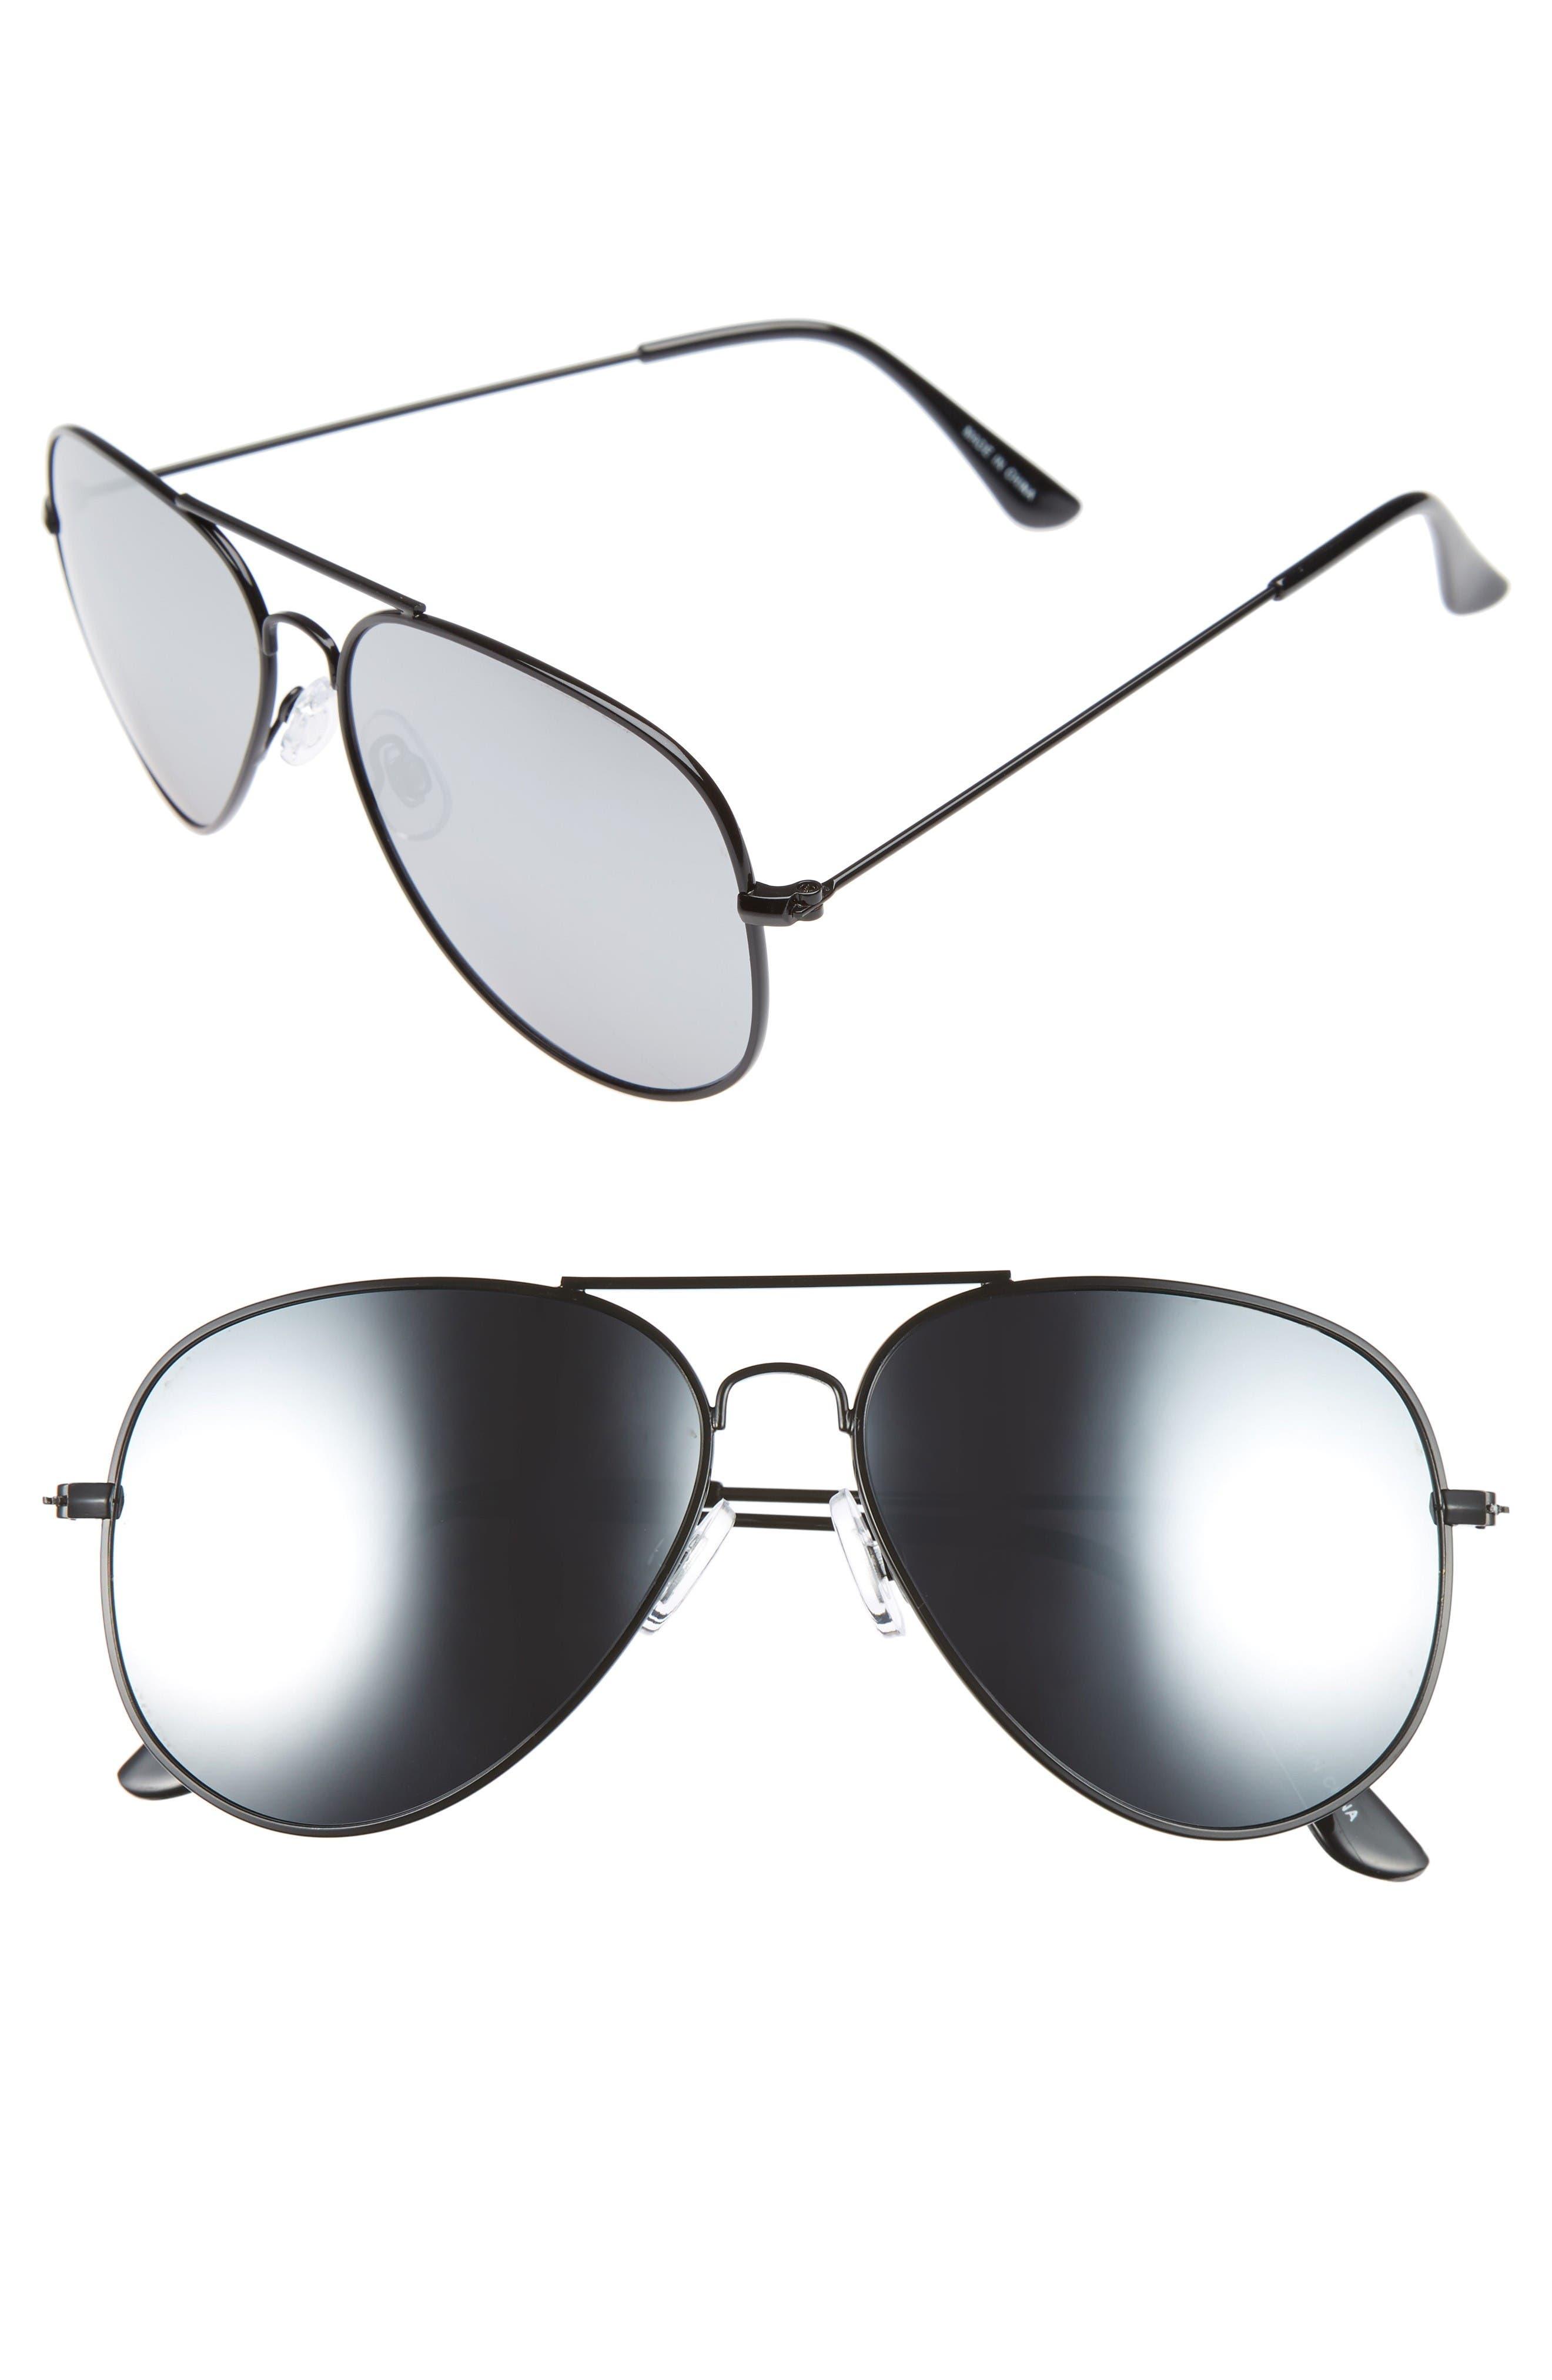 Alternate Image 1 Selected - BP. Mirrored Aviator 57mm Sunglasses